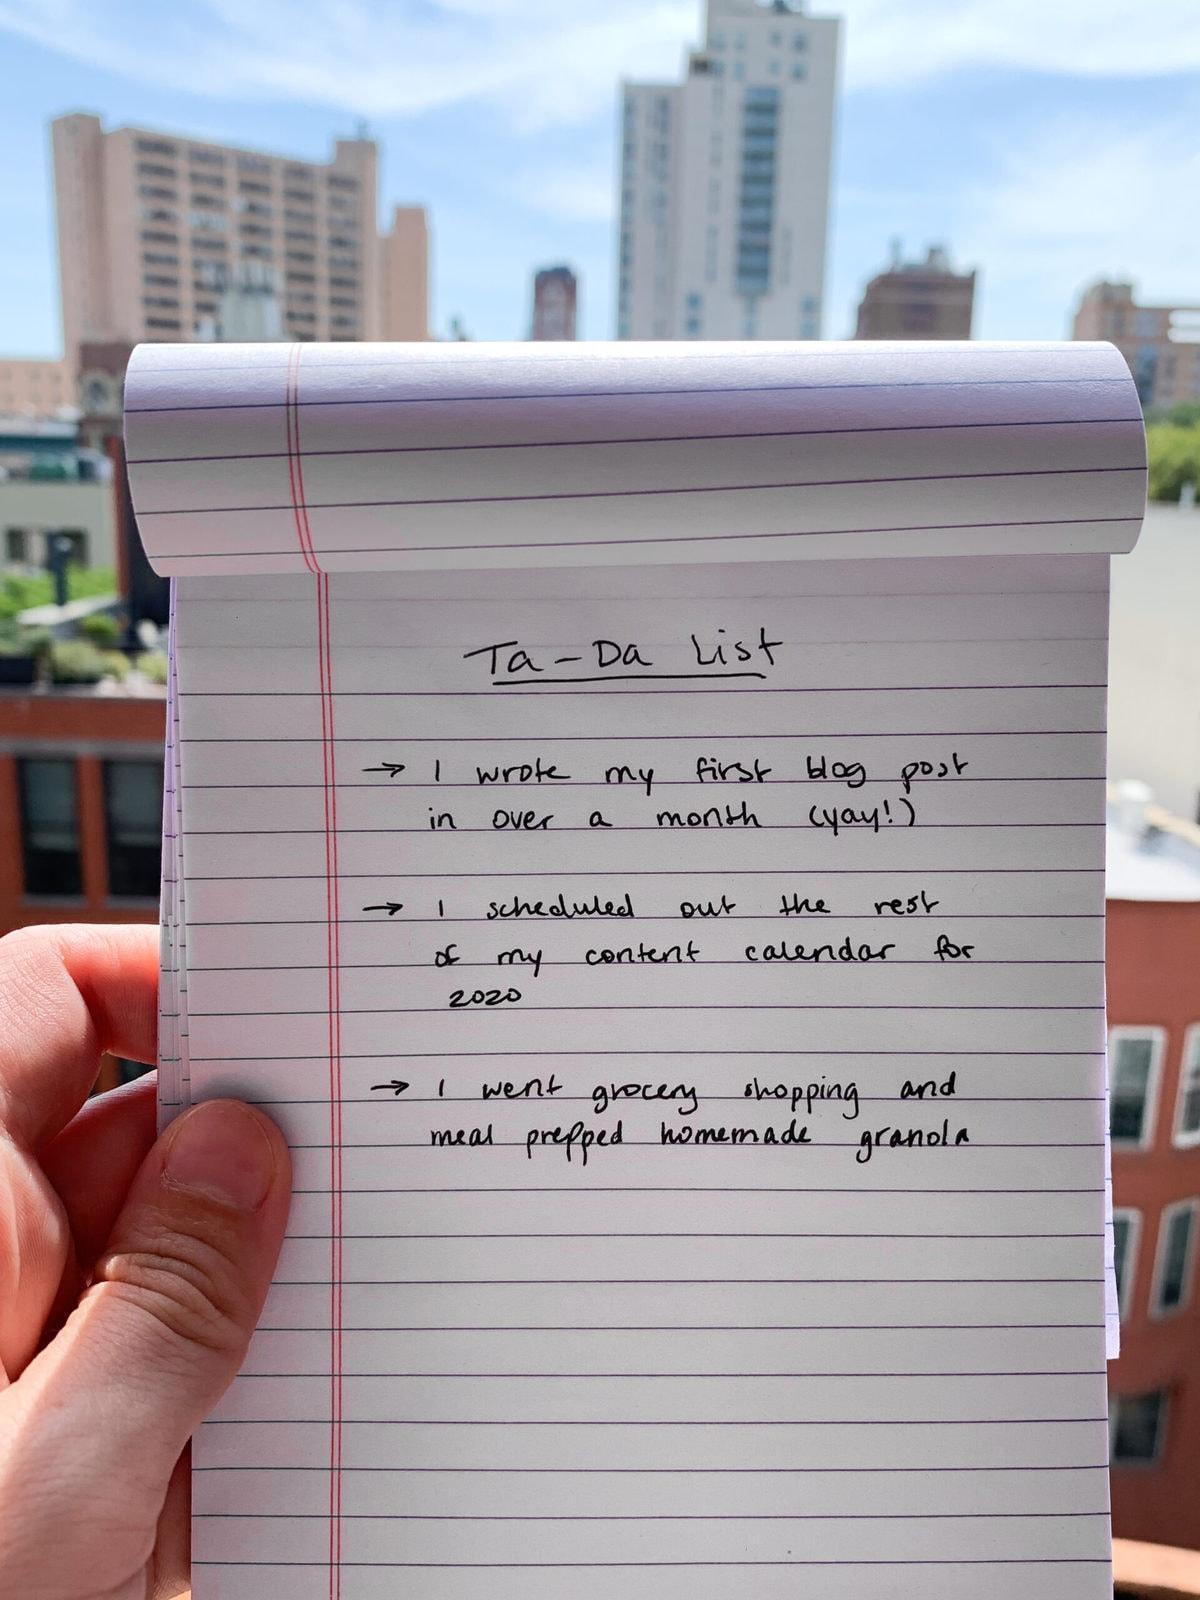 Notepad with ta-da list